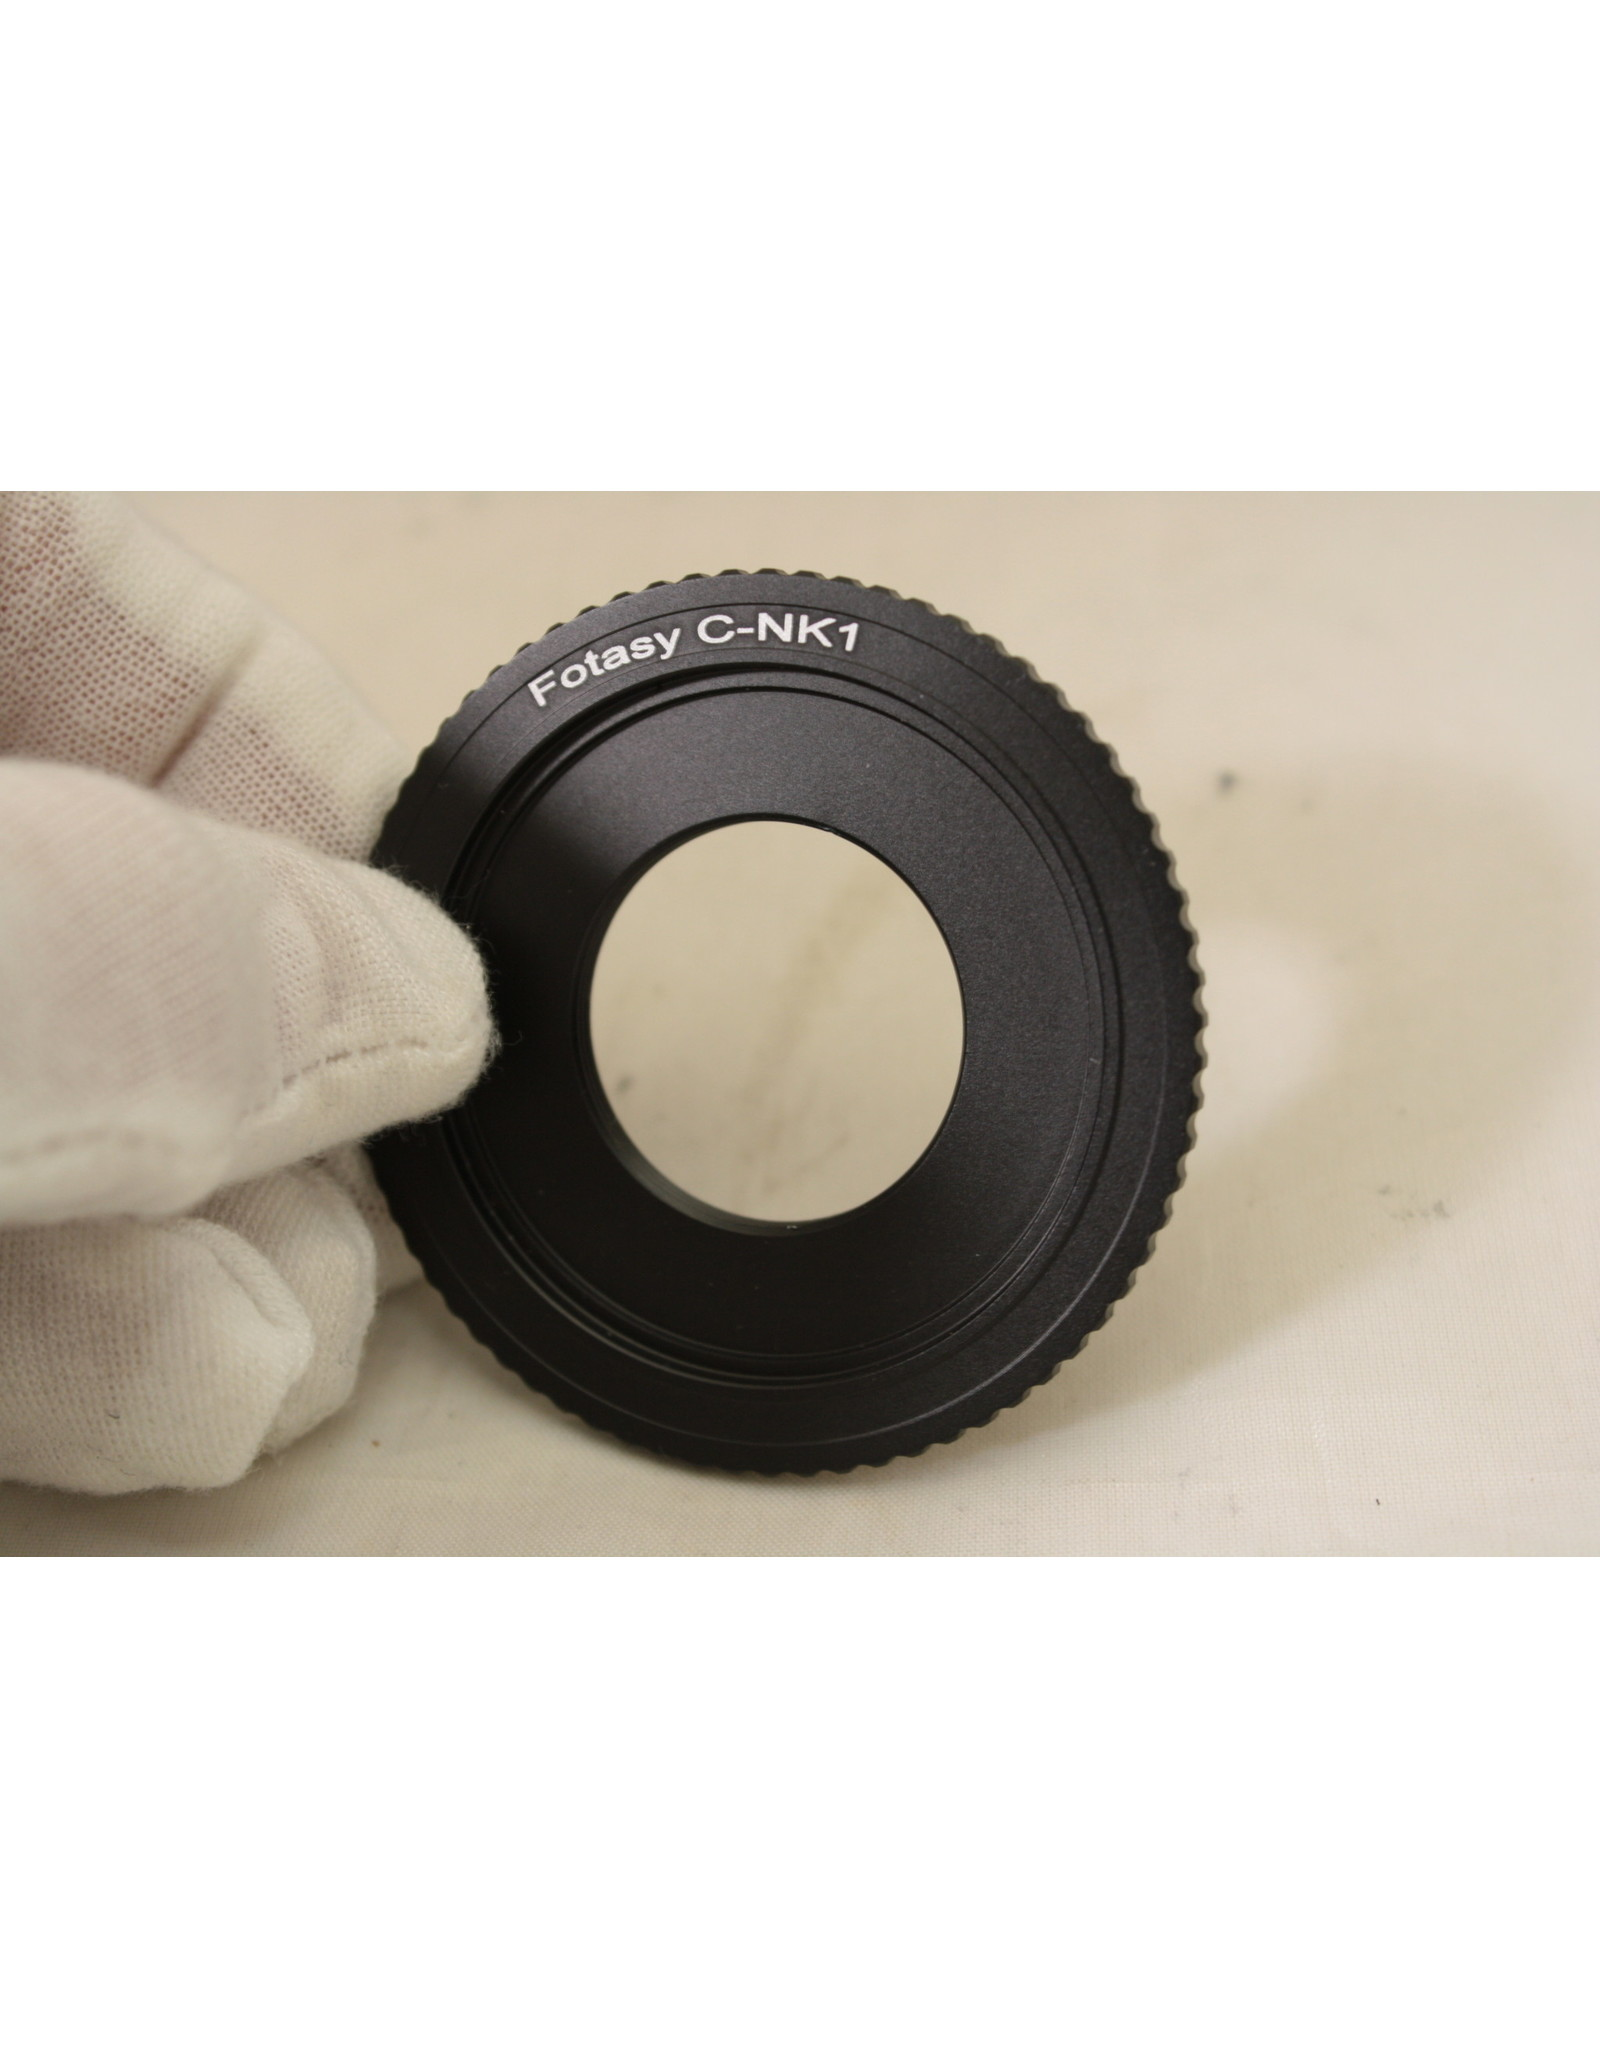 Arcturus C to Nikon Mount Adapter